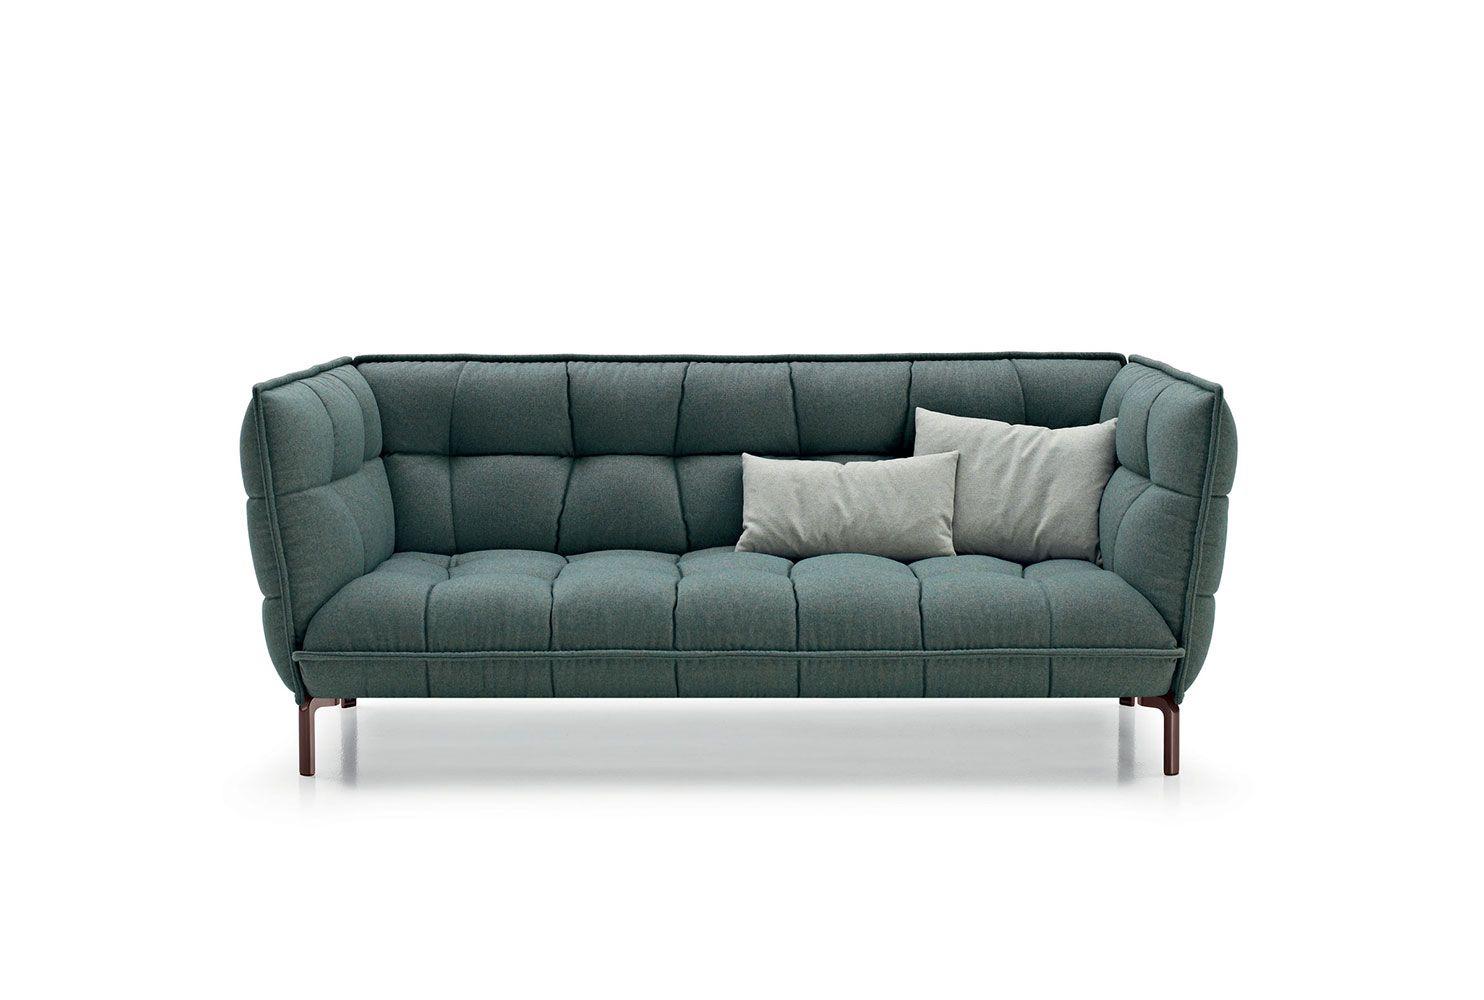 Sofa: HUSK-SOFA - Collection: B&B Italia - Design: Patricia ...